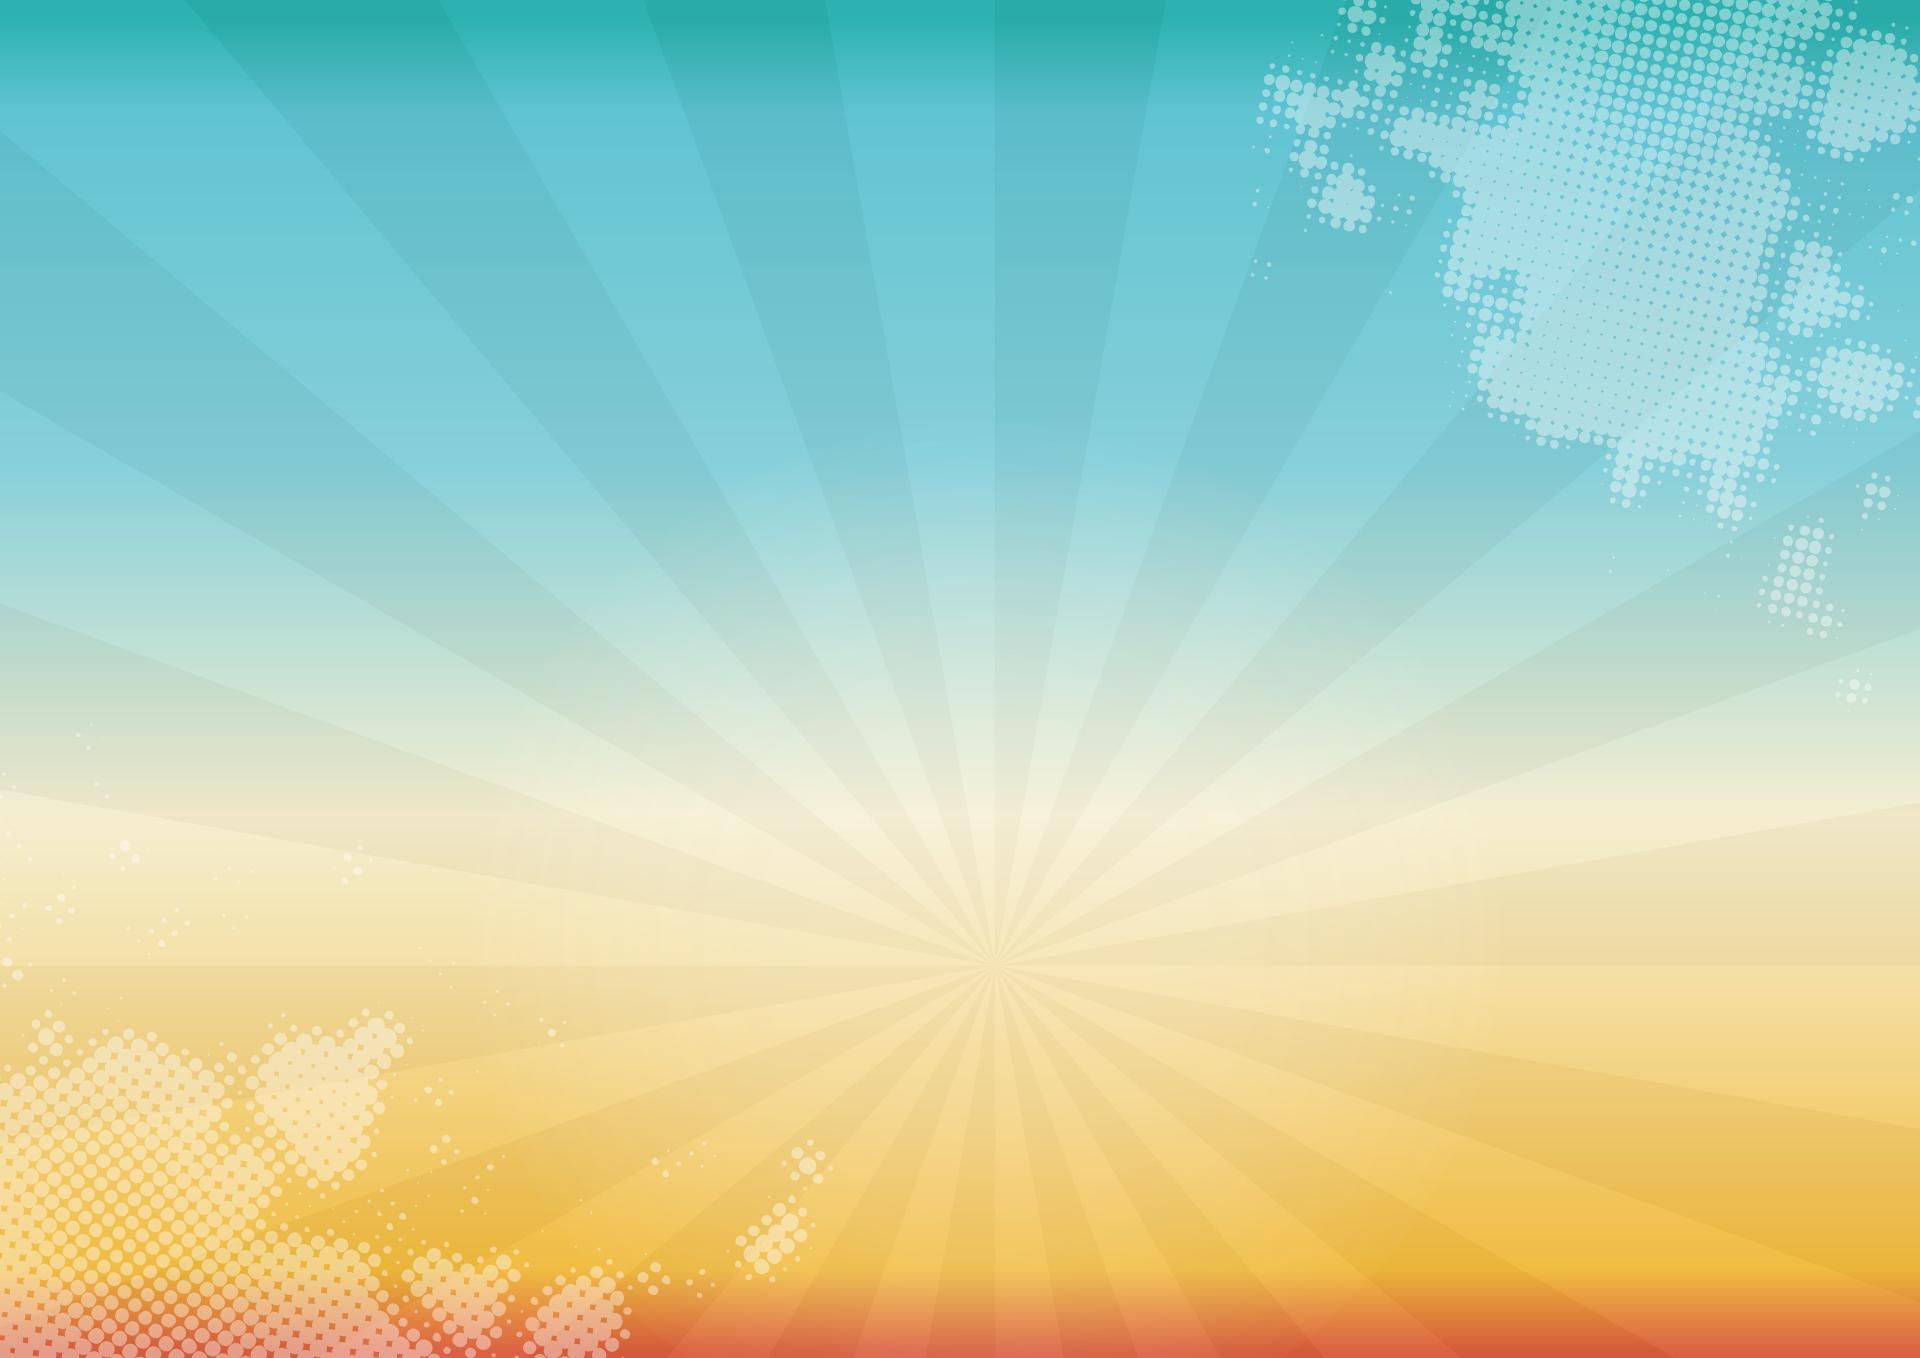 gradiente, Raios, luzes, nuvens, colorido - Papéis de parede HD - Professor-falken.com